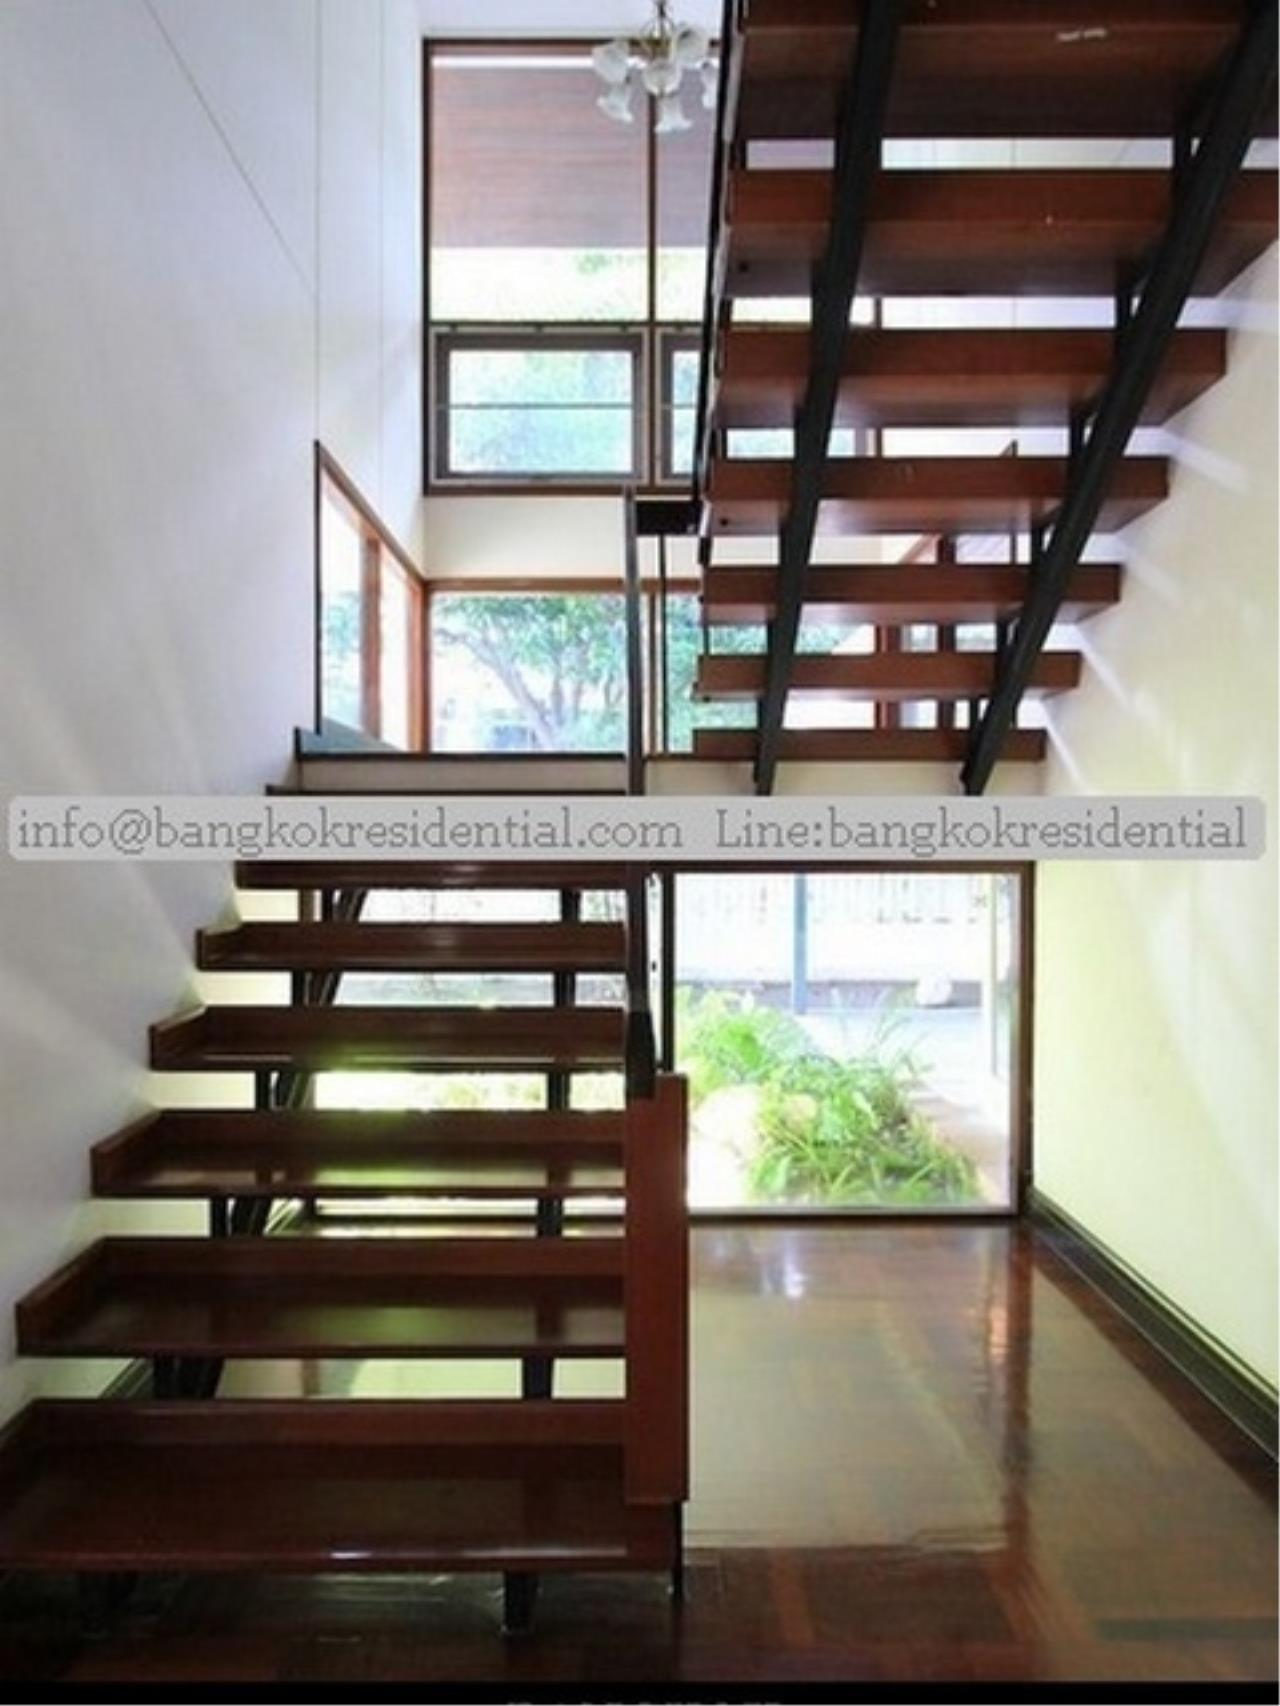 Bangkok Residential Agency's 3 Bed Single House For Rent in Nana BR7742SH 4